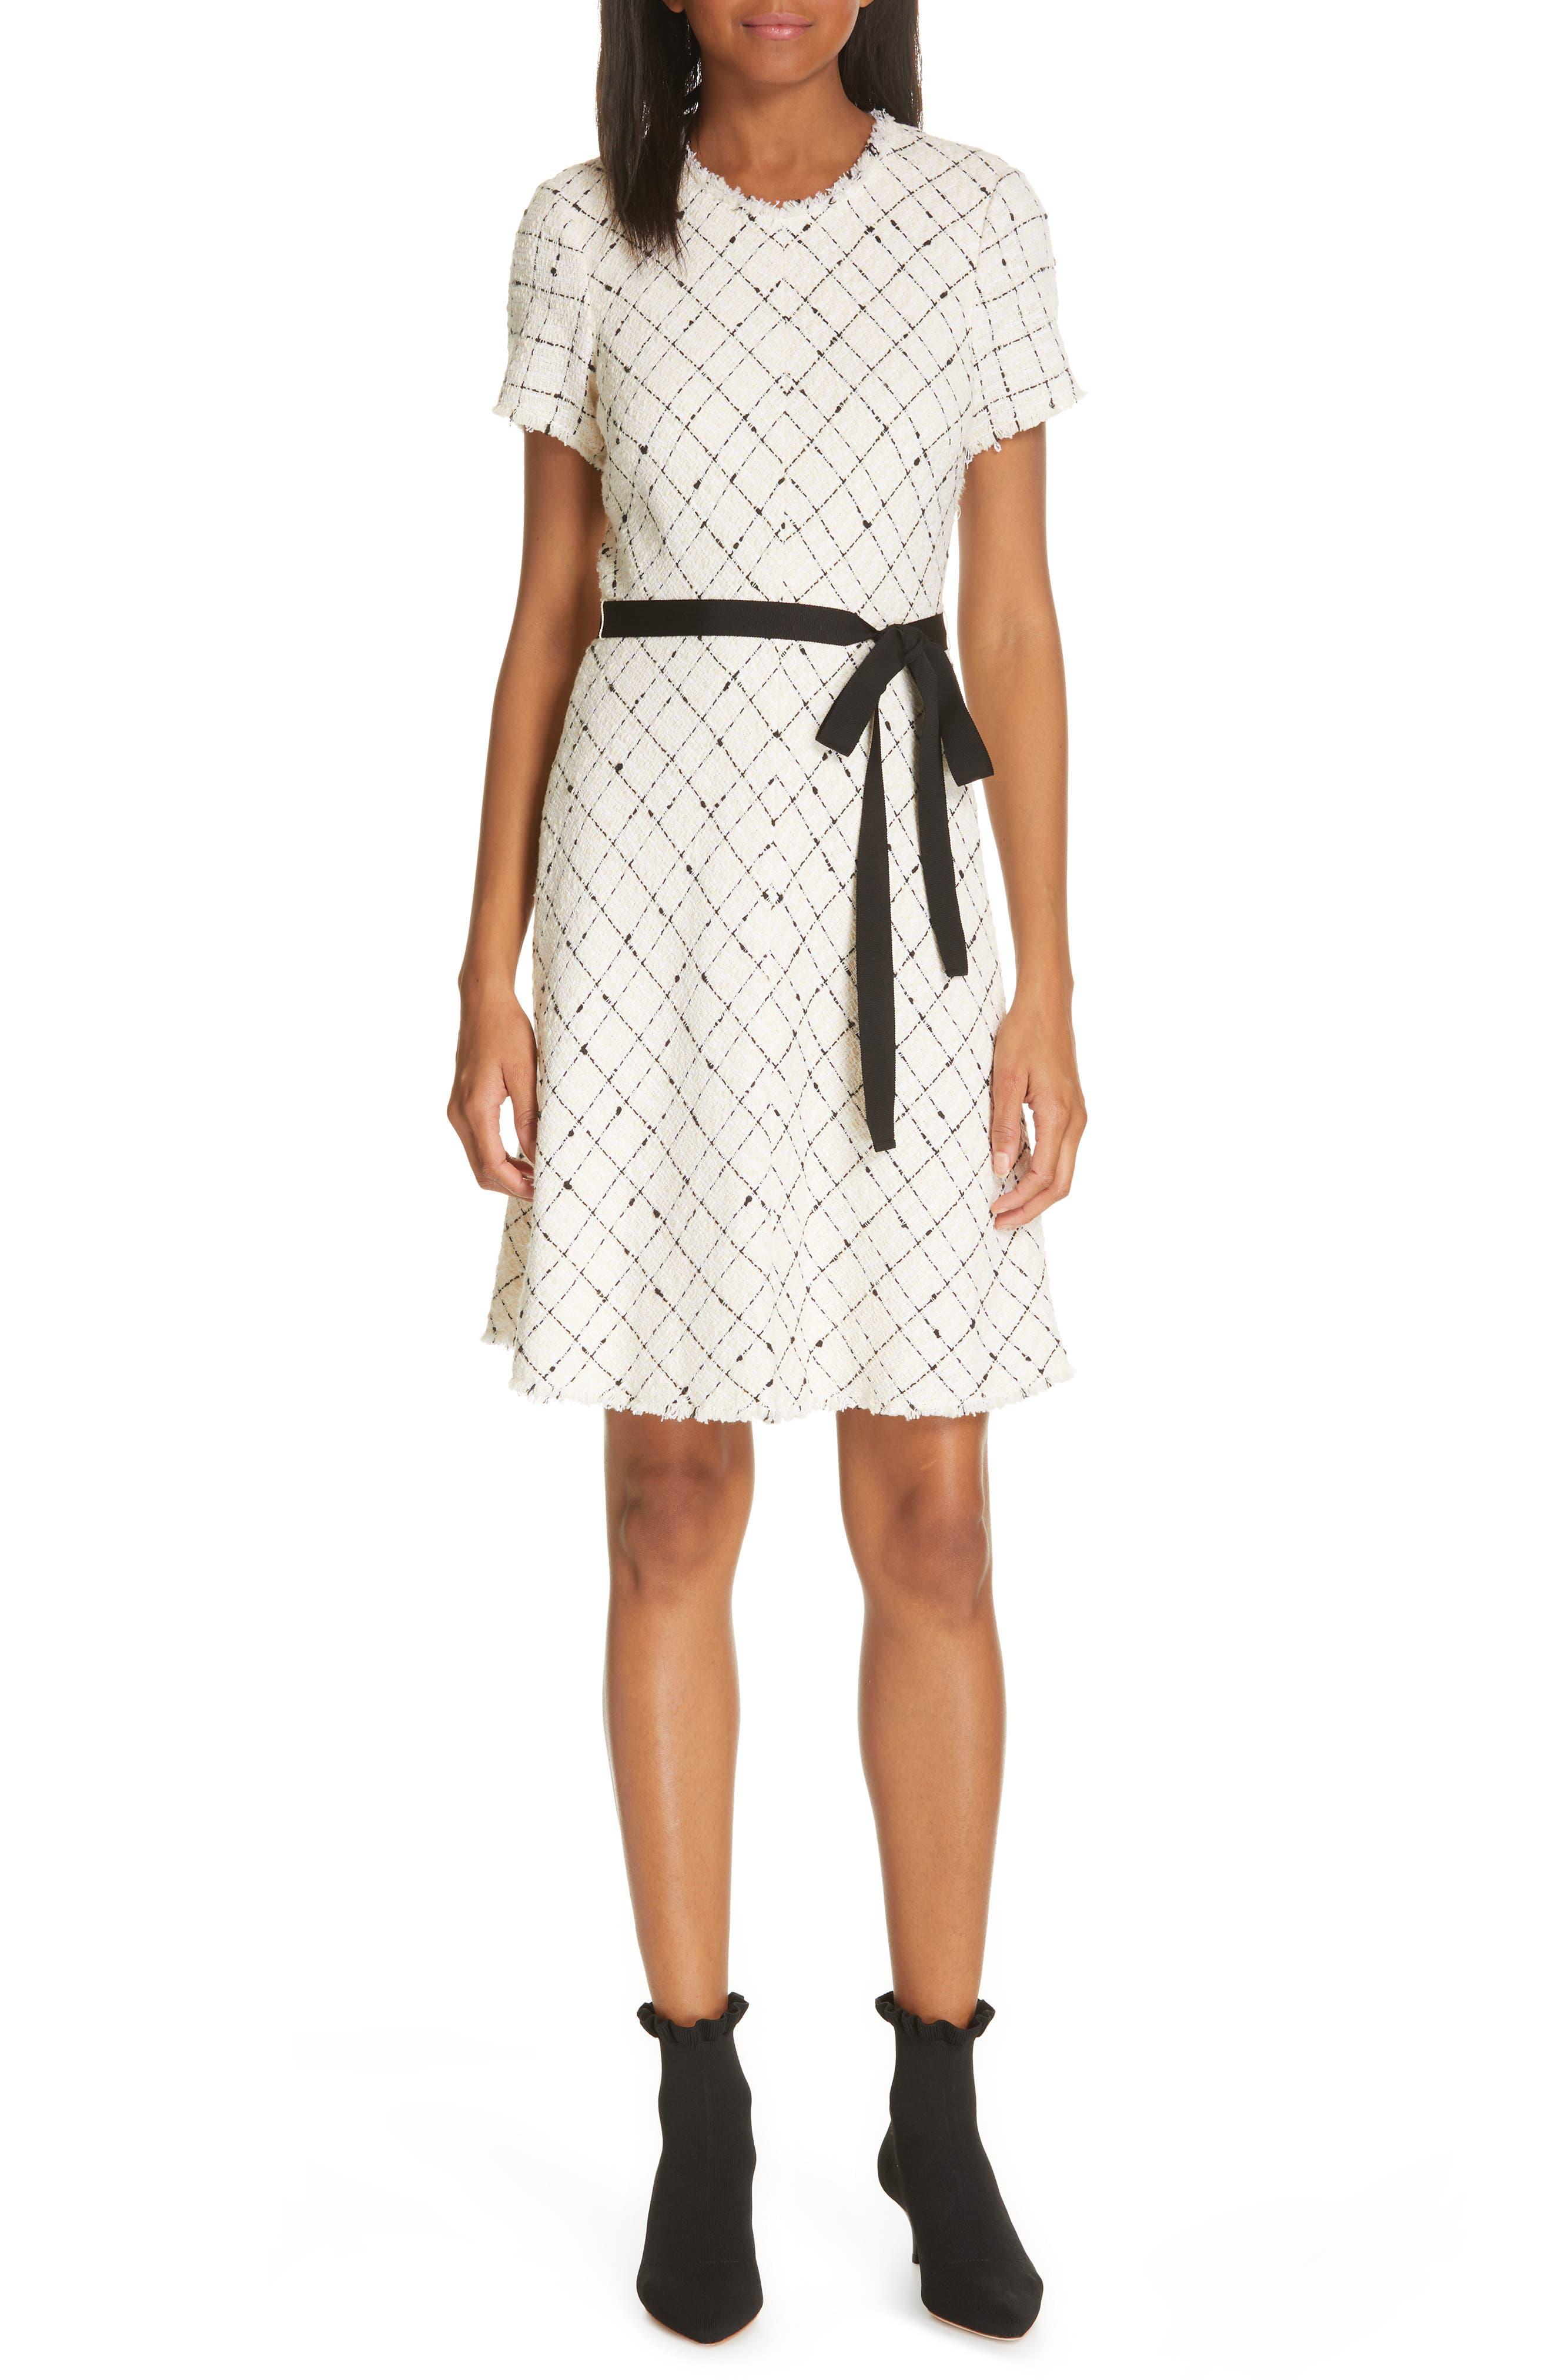 REBECCA TAYLOR Plaid Tweed Dress, Main, color, CREAM COMBO